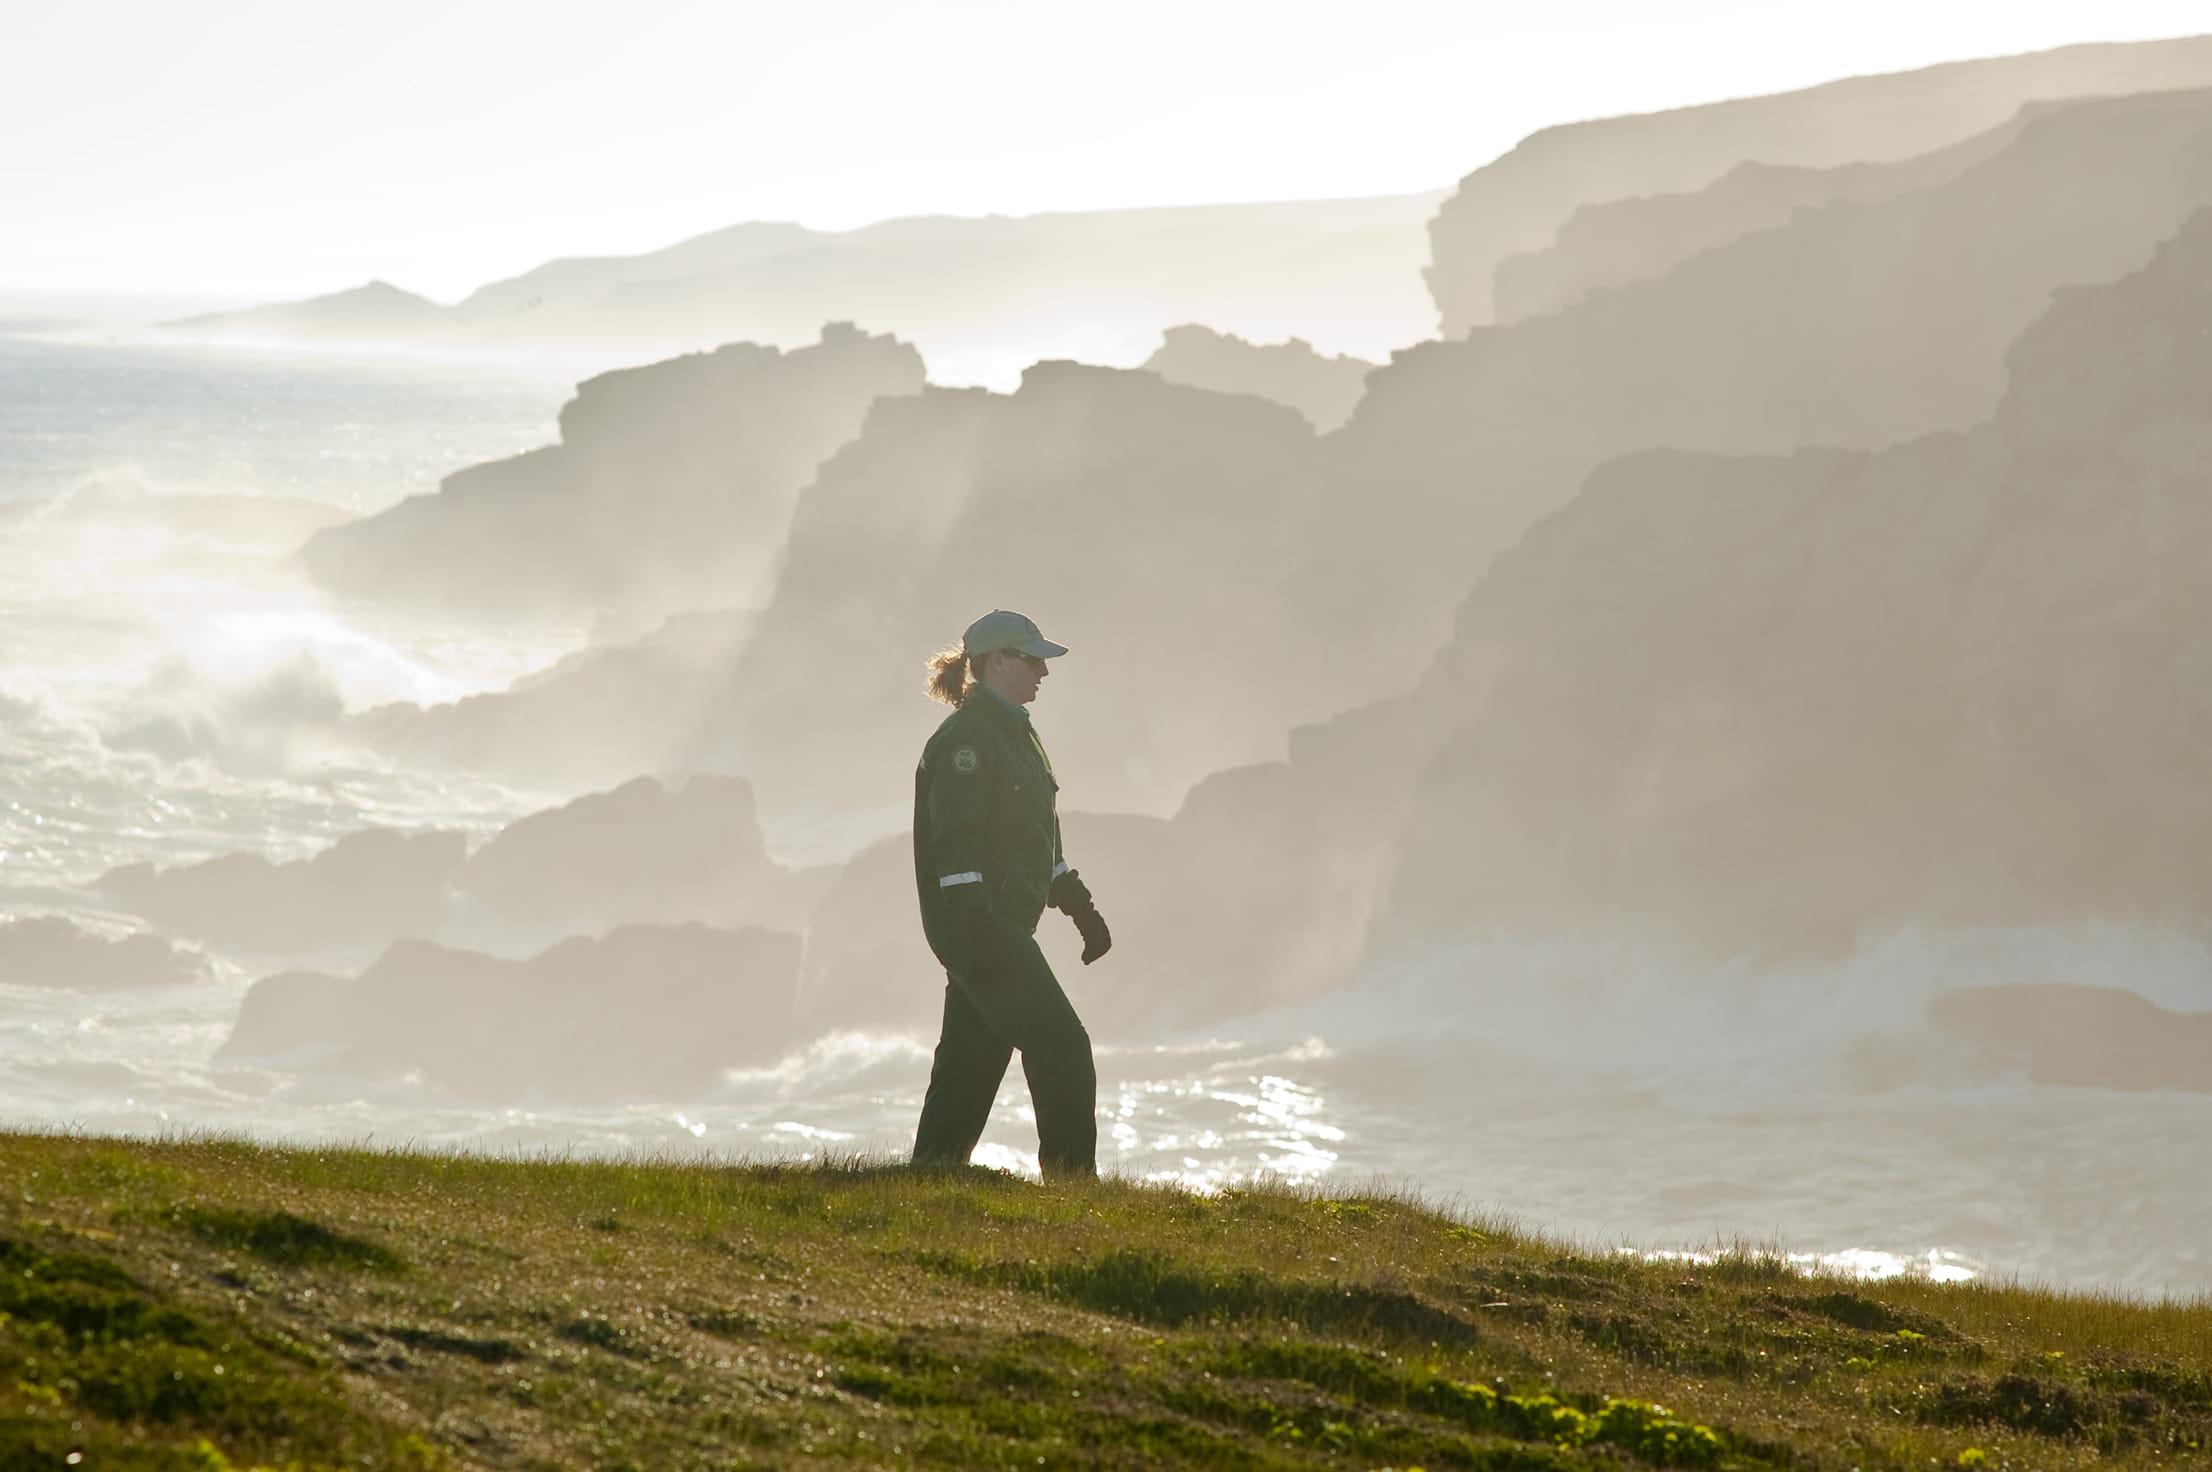 Tour Guide Near Coastline of Mistaken Point Ecological Reserve, Avalon